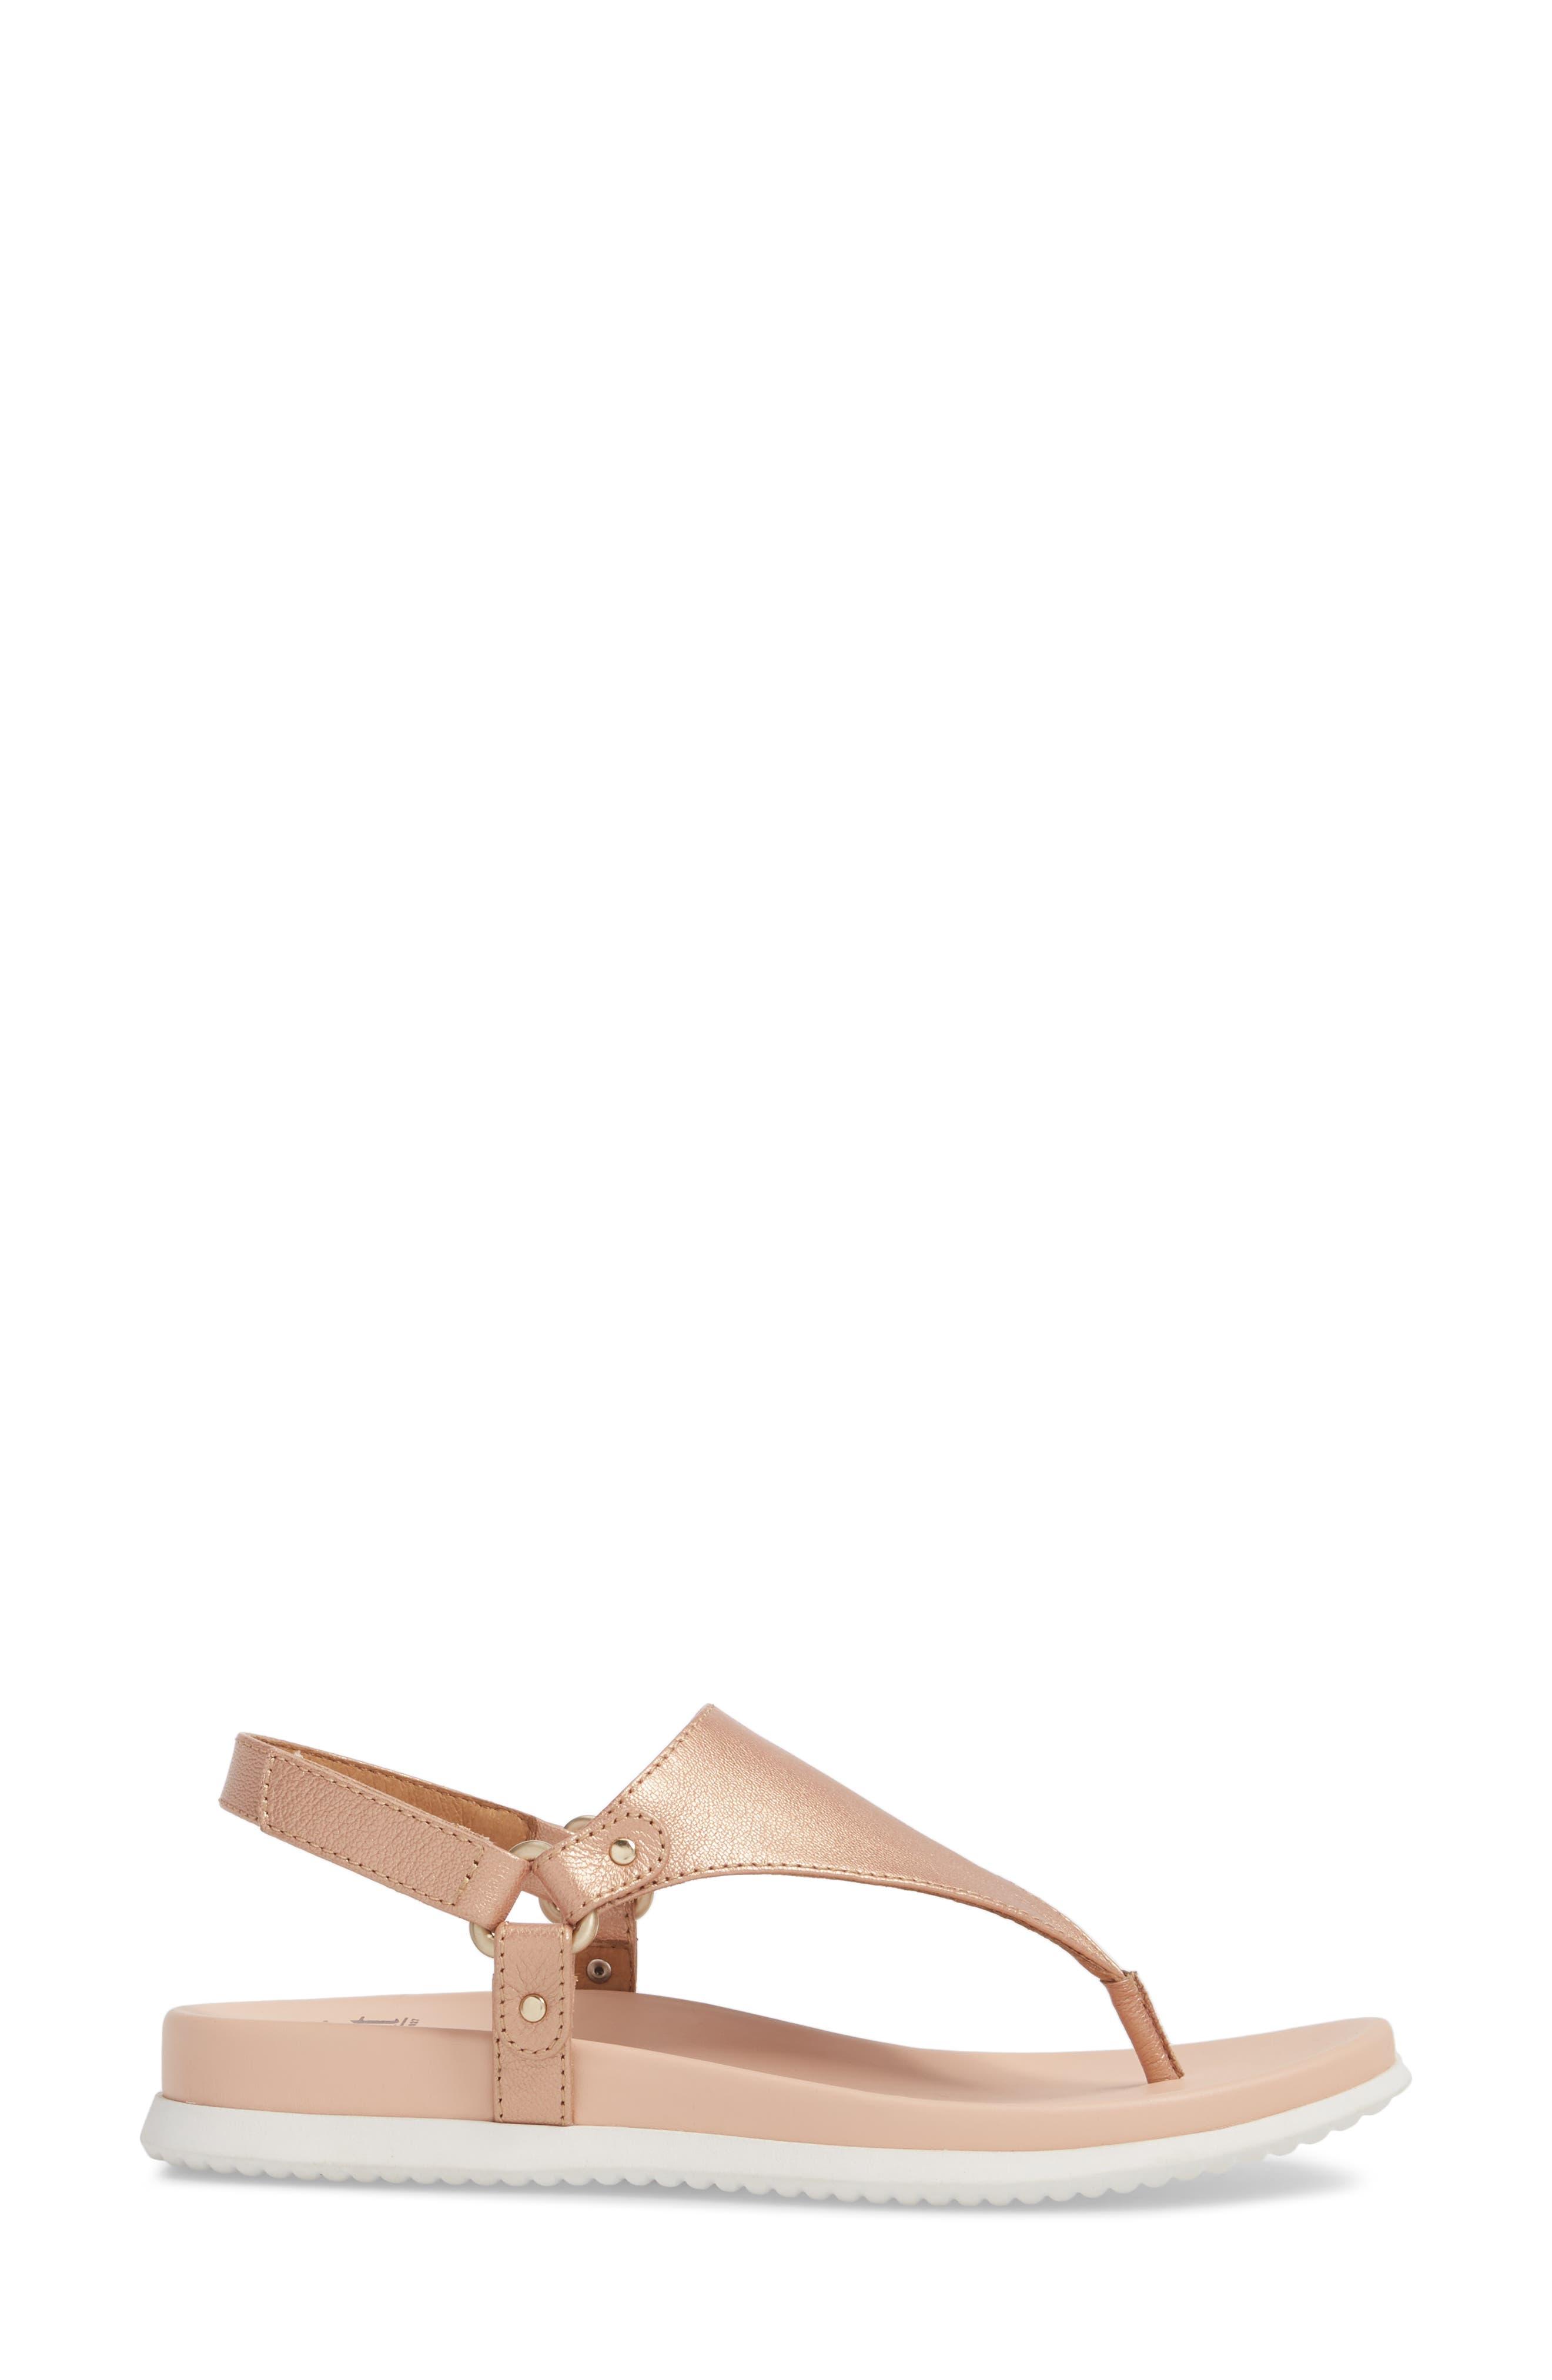 Felisa Sandal,                             Alternate thumbnail 3, color,                             Rose Gold Leather